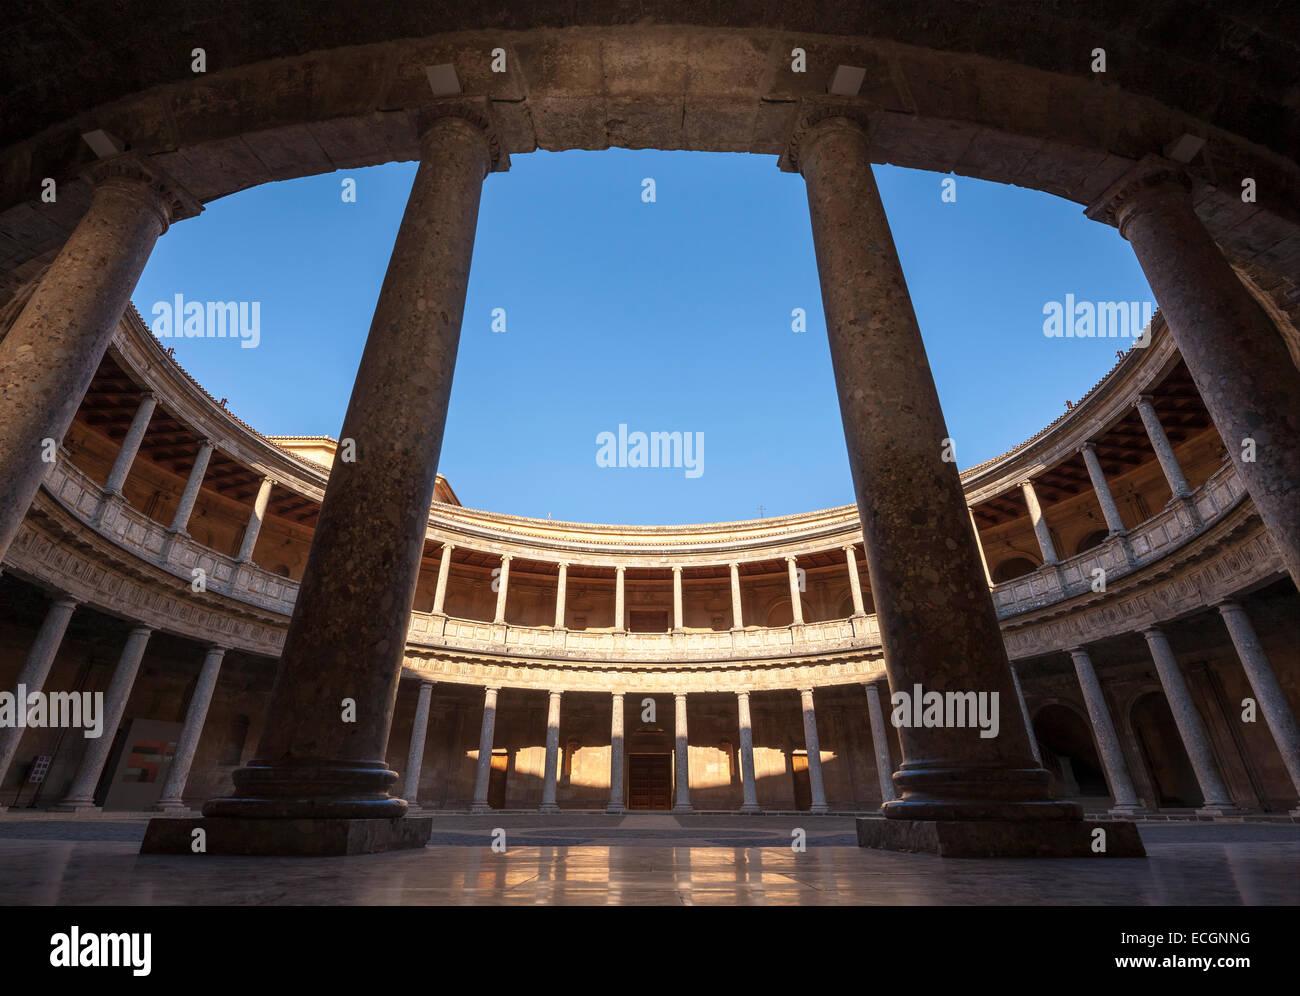 Renaissance palace of holy roman emperor Charles V in the Alhambra Granada Spain. Palacio Carlos V. Inner circular Stock Photo